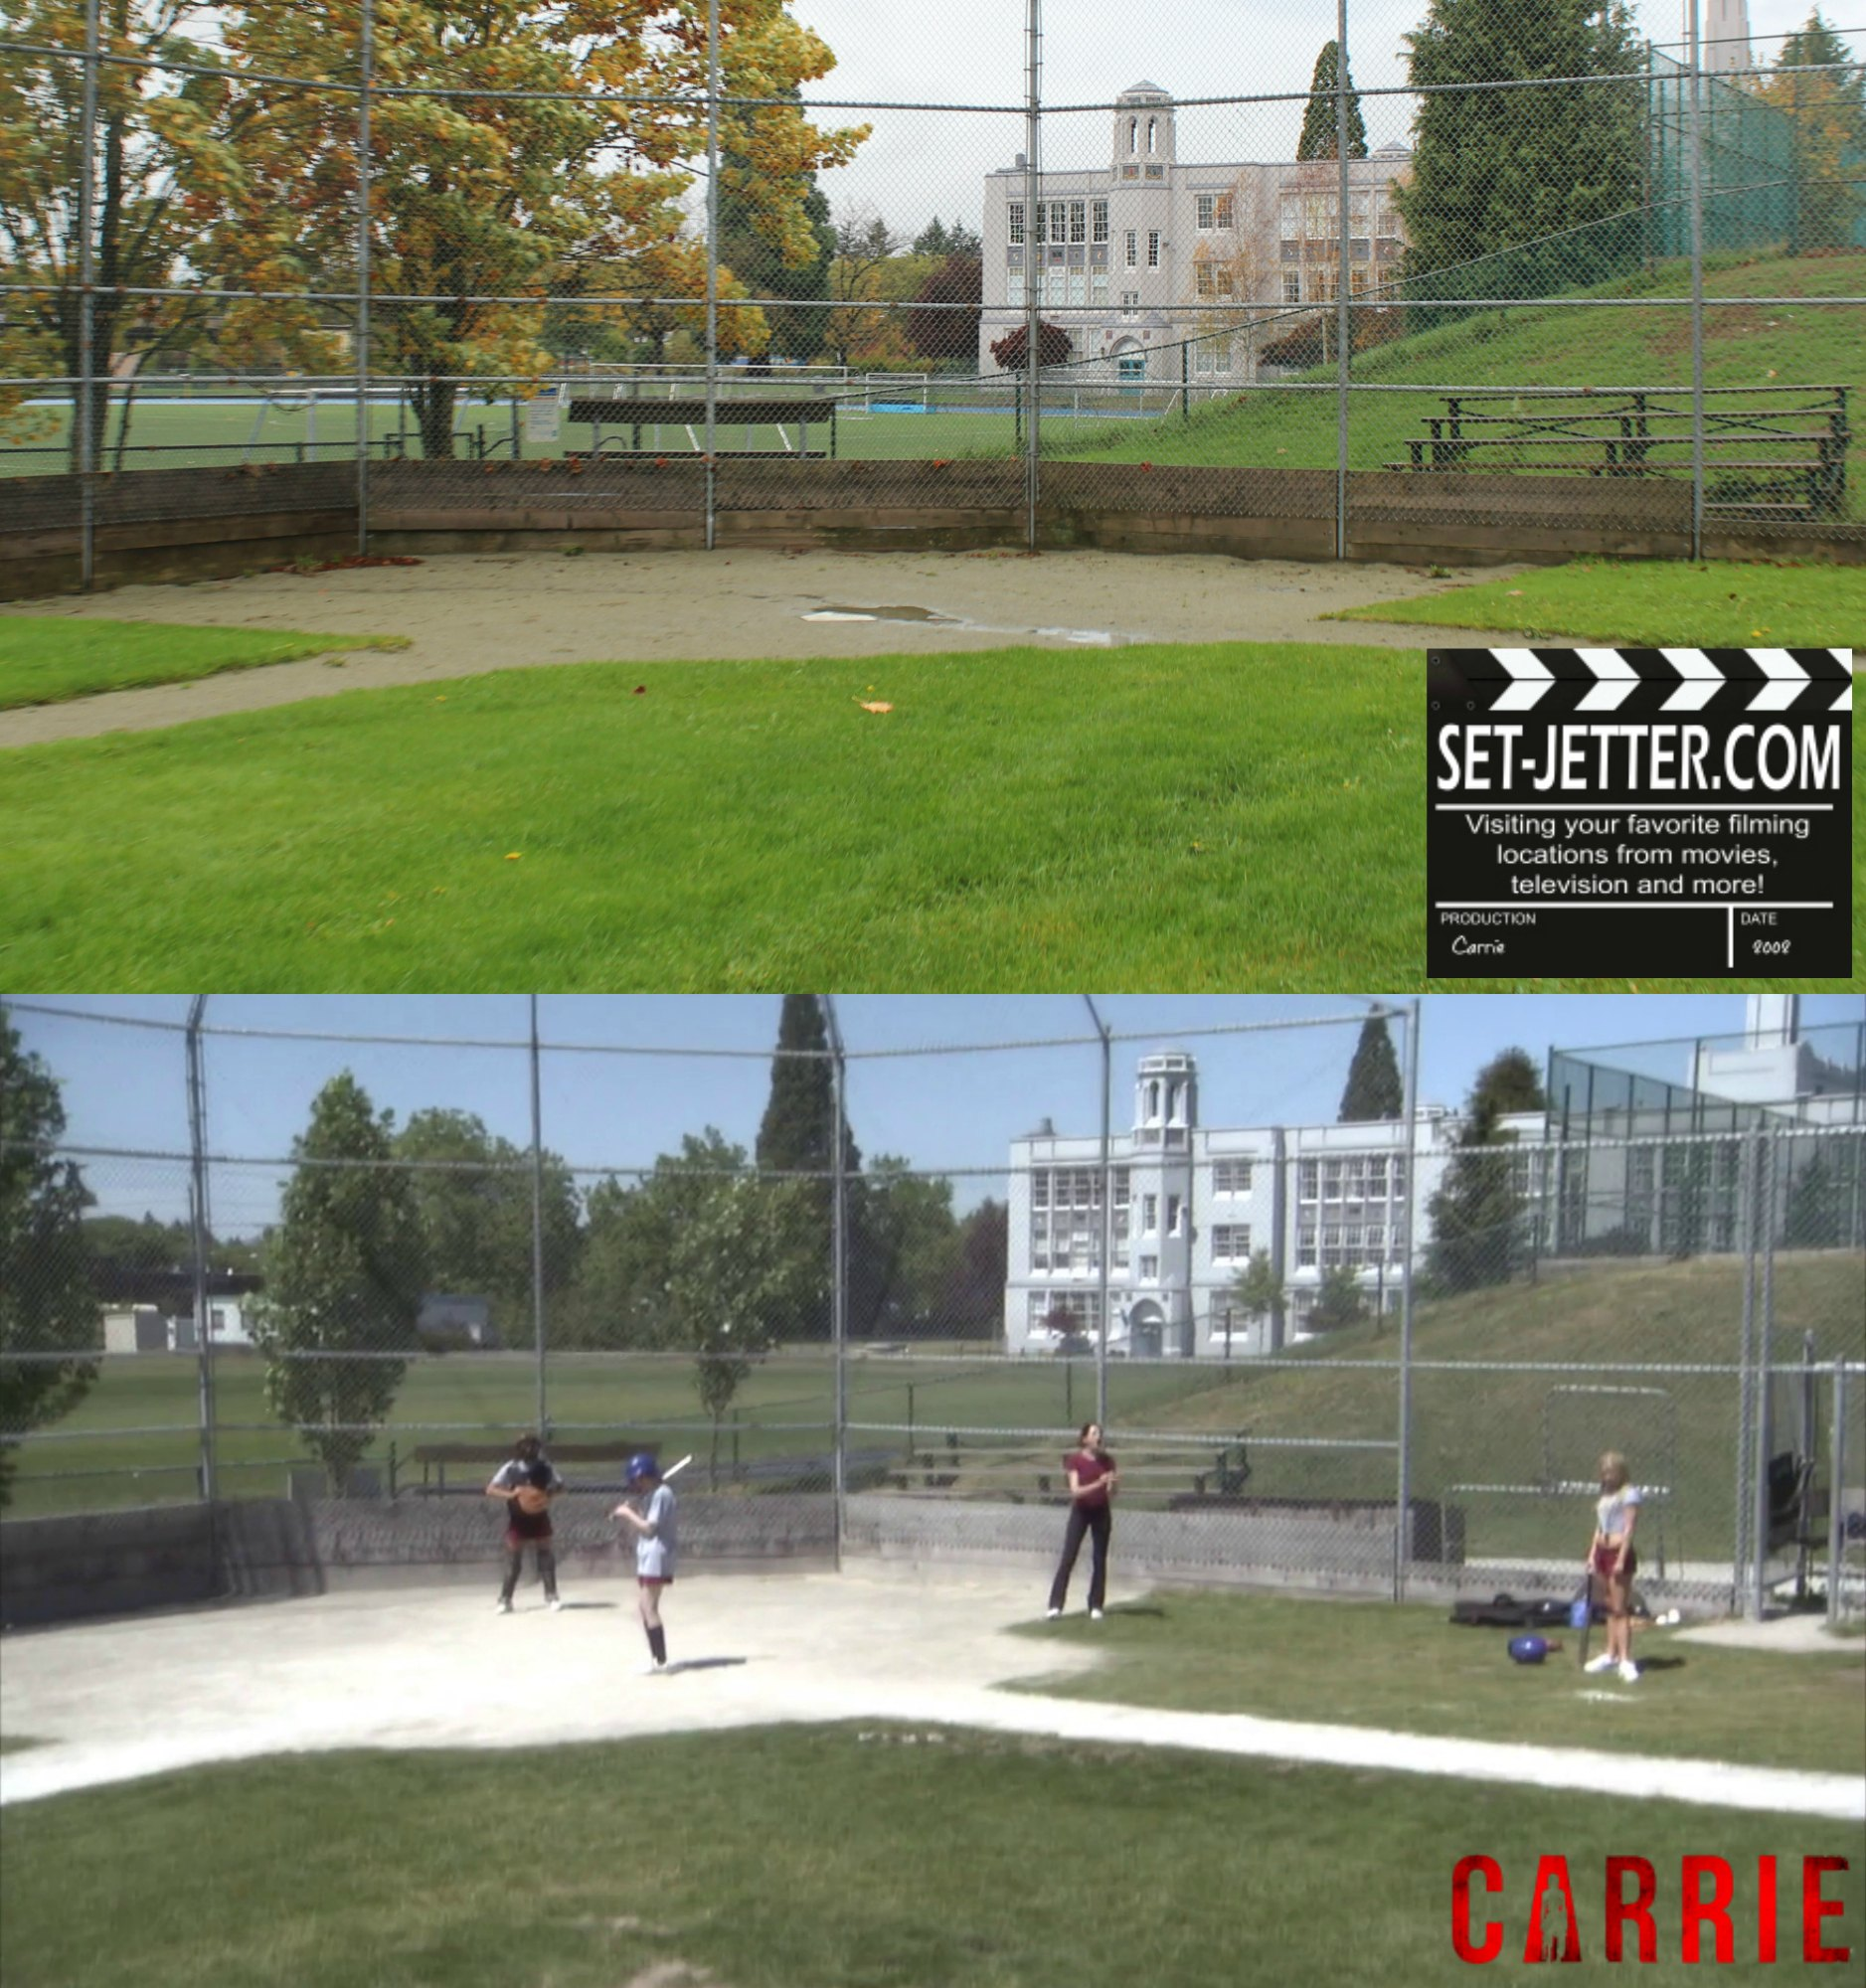 carrie 2002 comparison 04.jpg